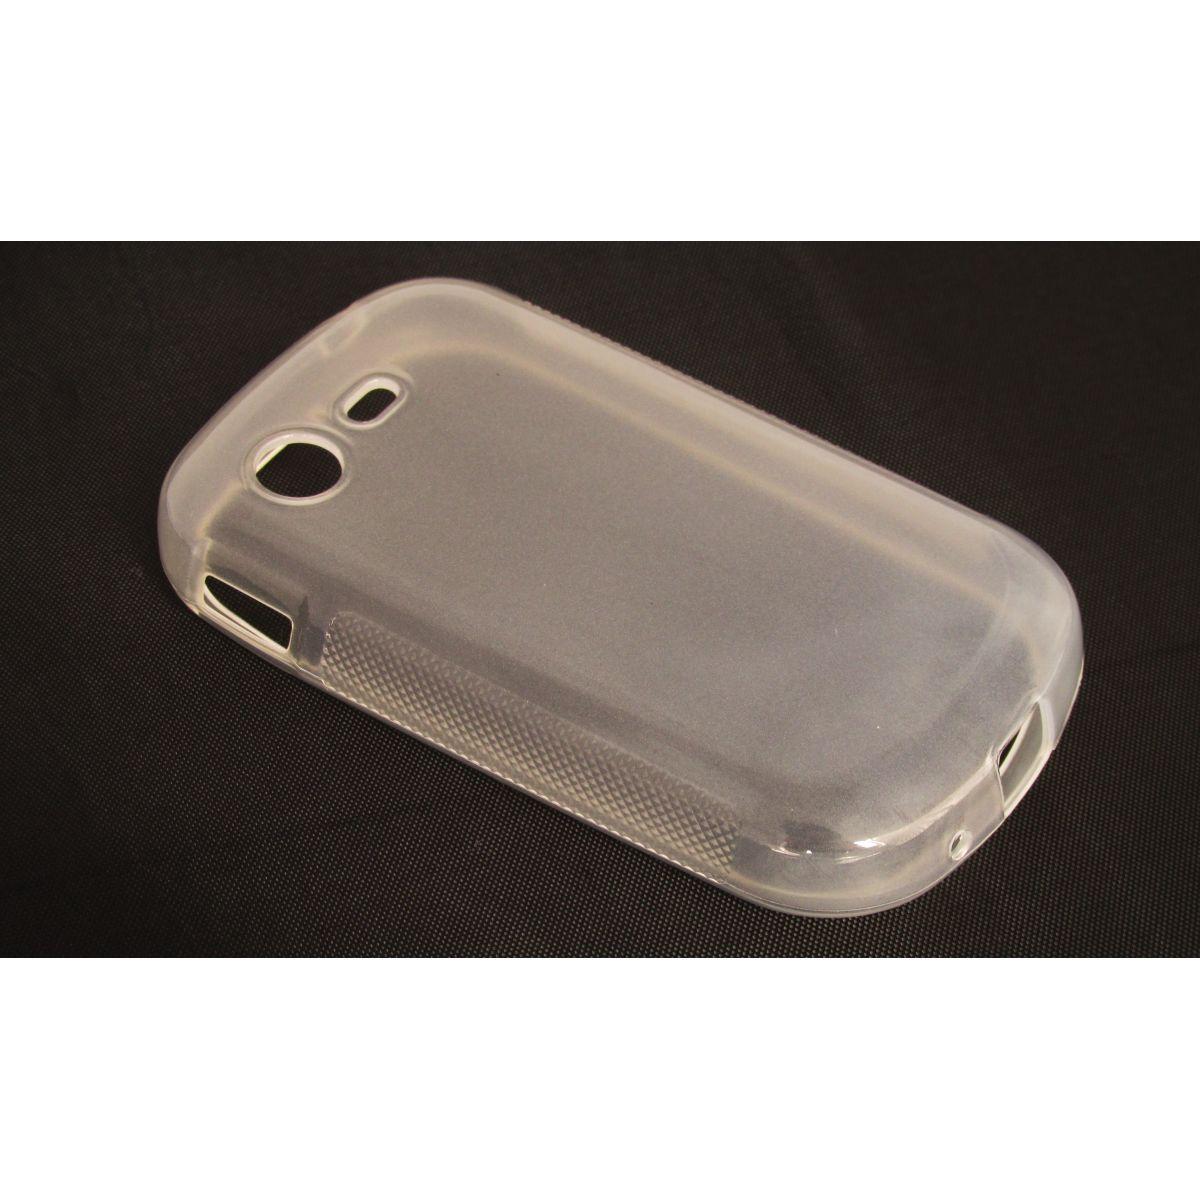 Capa TPU Transparente Samsung Galaxy Star Trios S5283 + Película Flexível